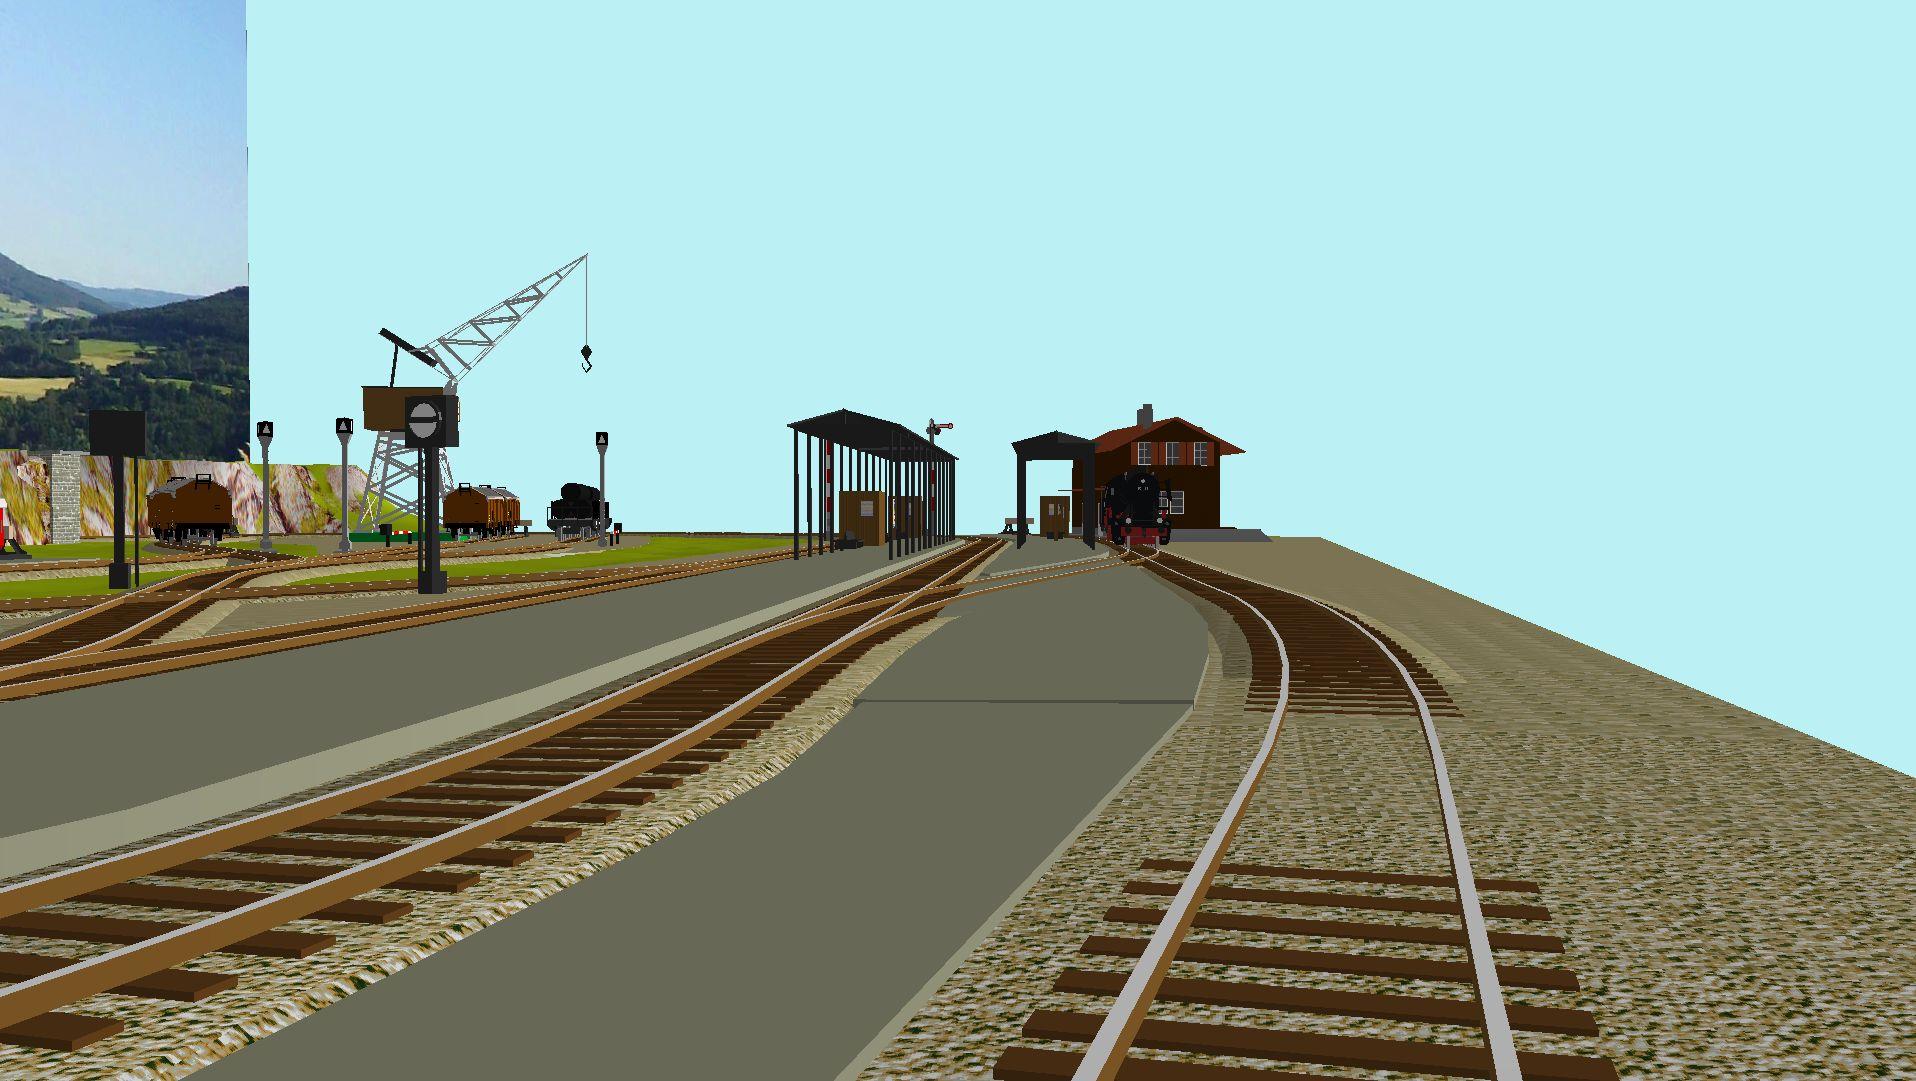 'ALBA Modellbahnpraxis' Band 1, Plan 5 Amp-1_5_c-gleis_freil0zkgz